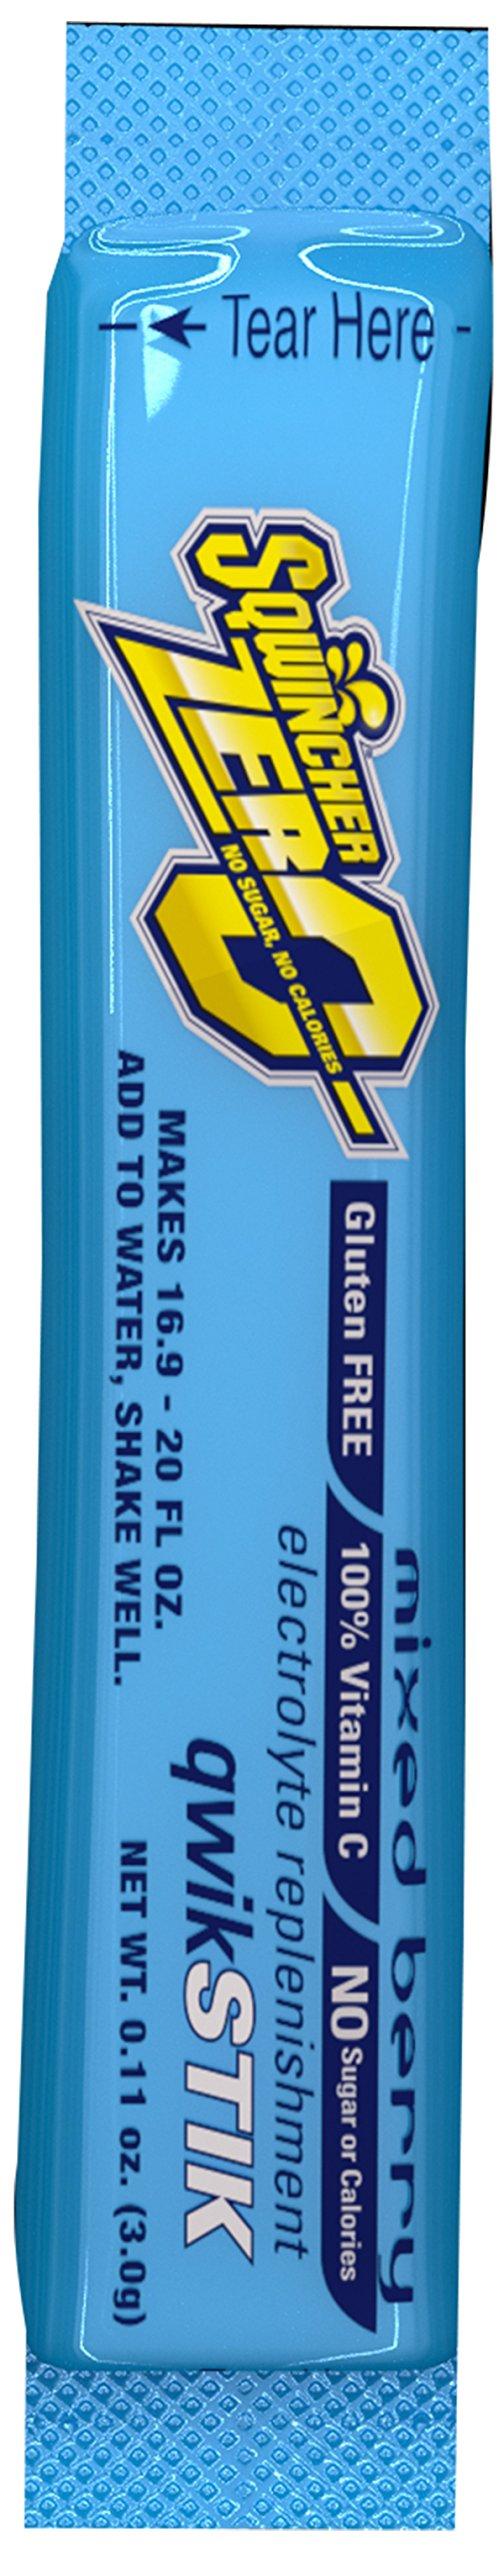 Sqwincher ZERO Qwik Stik - Sugar Free Electrolyte Powdered Beverage Mix, Mixed Berry 060118-MB (Case of 200)